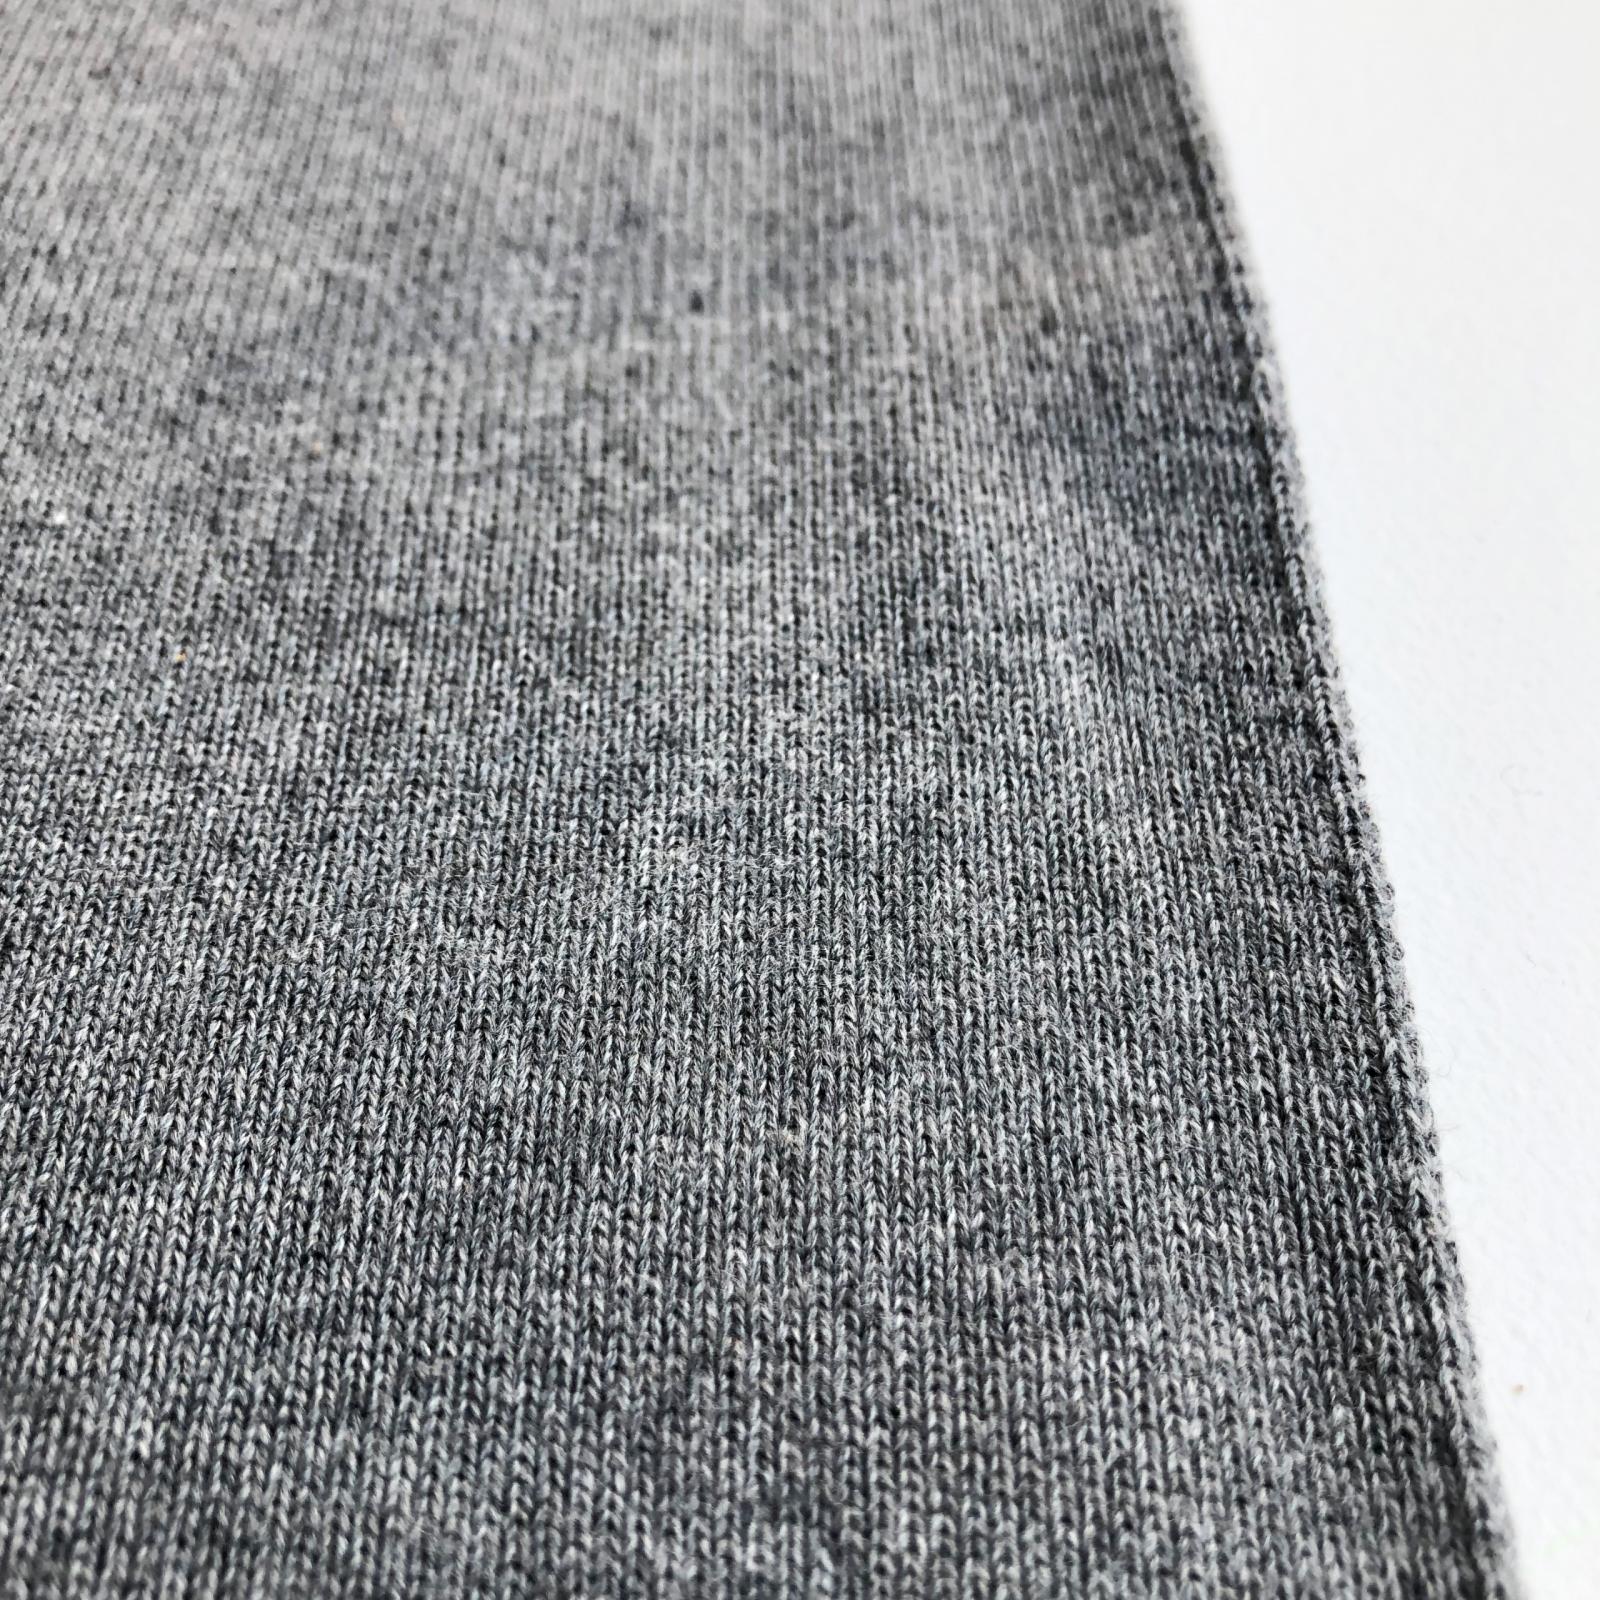 Designer Deadstock 1x1 Spun Rayon Heavyweight Sweatshirt Rib Knit - Heather Charcoal Gray 36